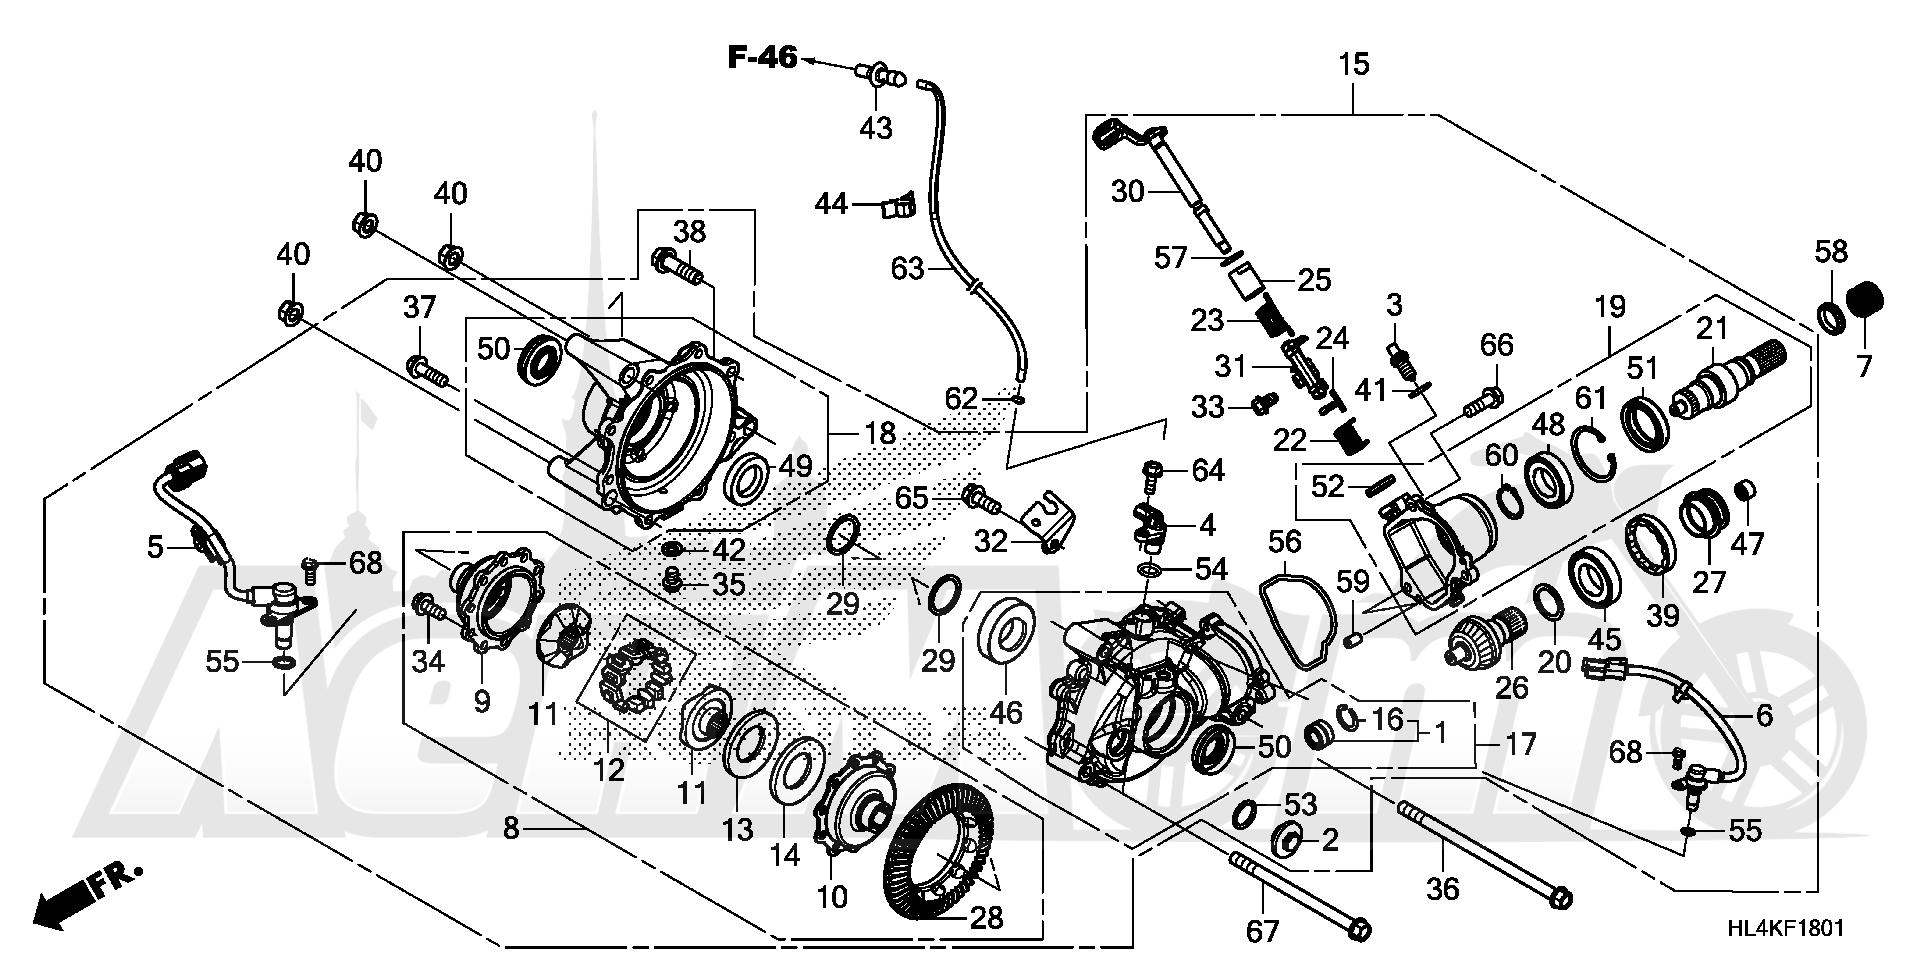 Запчасти для Квадроцикла Honda 2019 SXS1000M5L Раздел: FRONT FINAL GEAR (2) | перед FINAL шестерня (2)